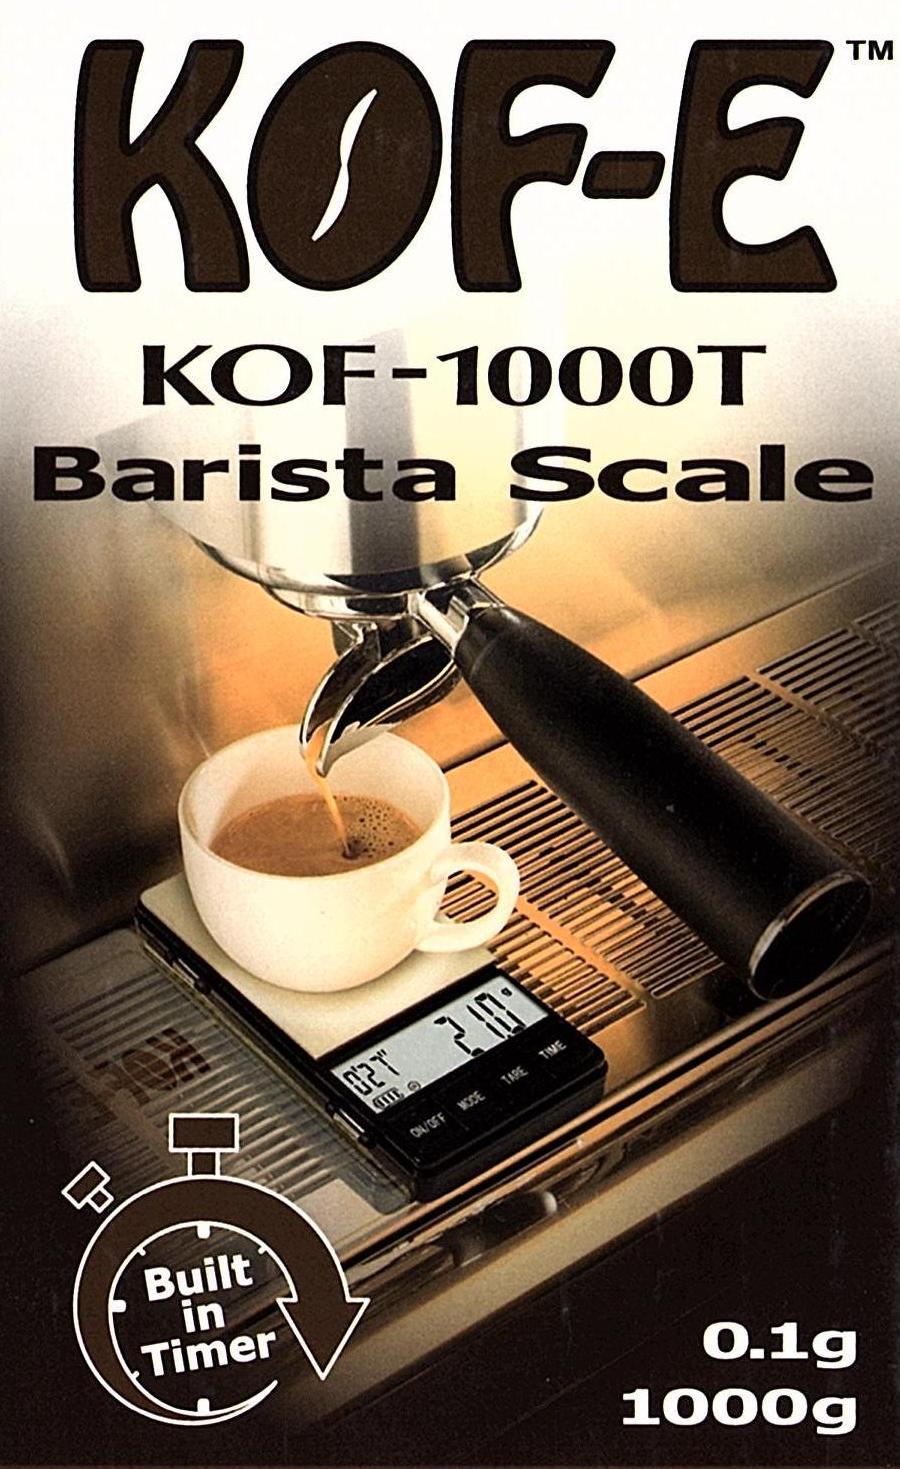 On Balance Coffee Scale KOF-1000T (1000g x 0.1g)